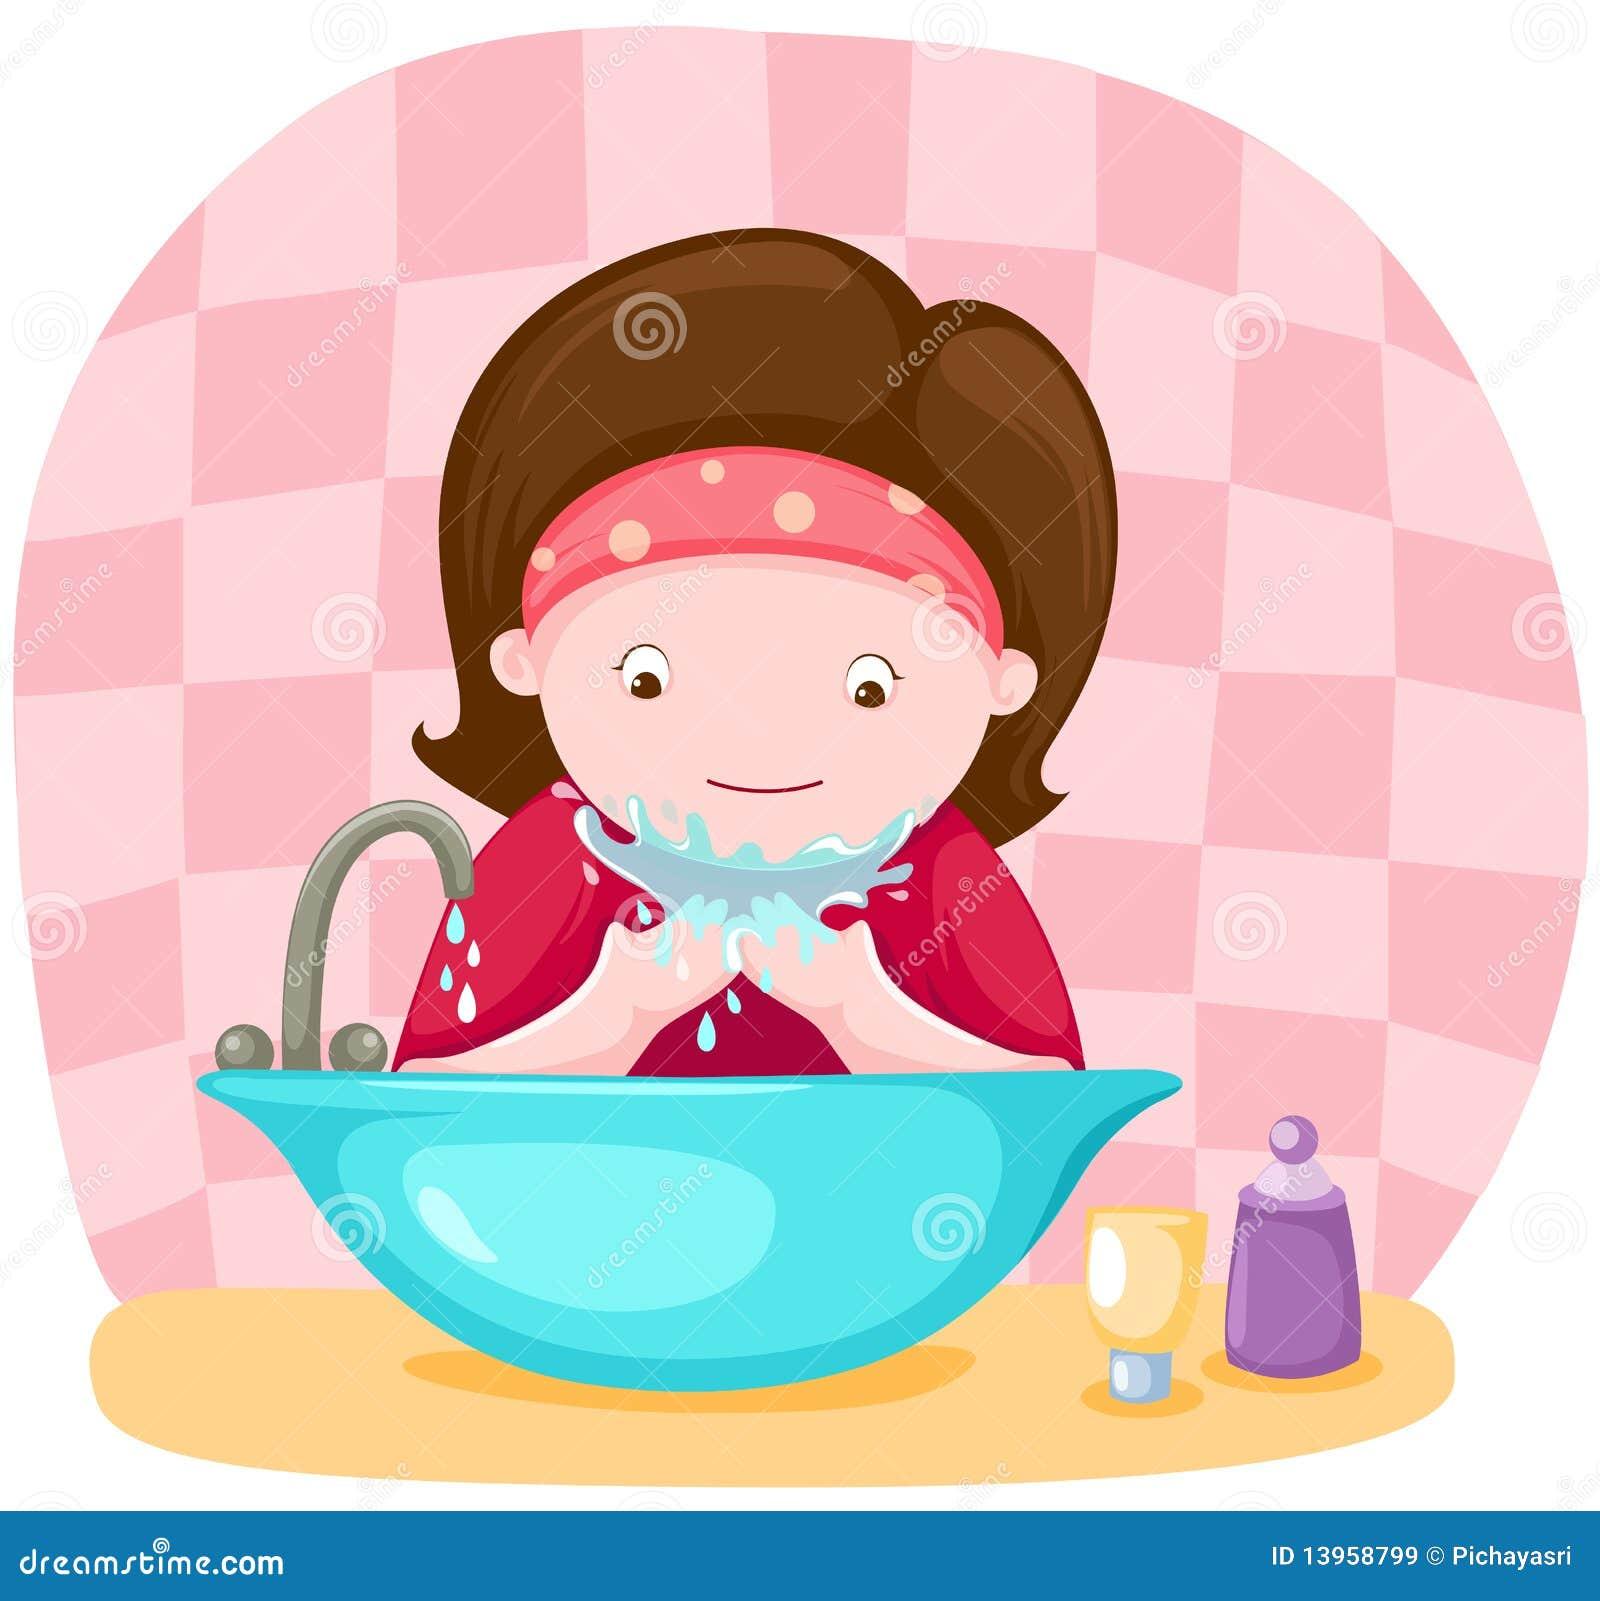 Cute Of Cartoon Washing Face Stock Vector - Image: 40625553